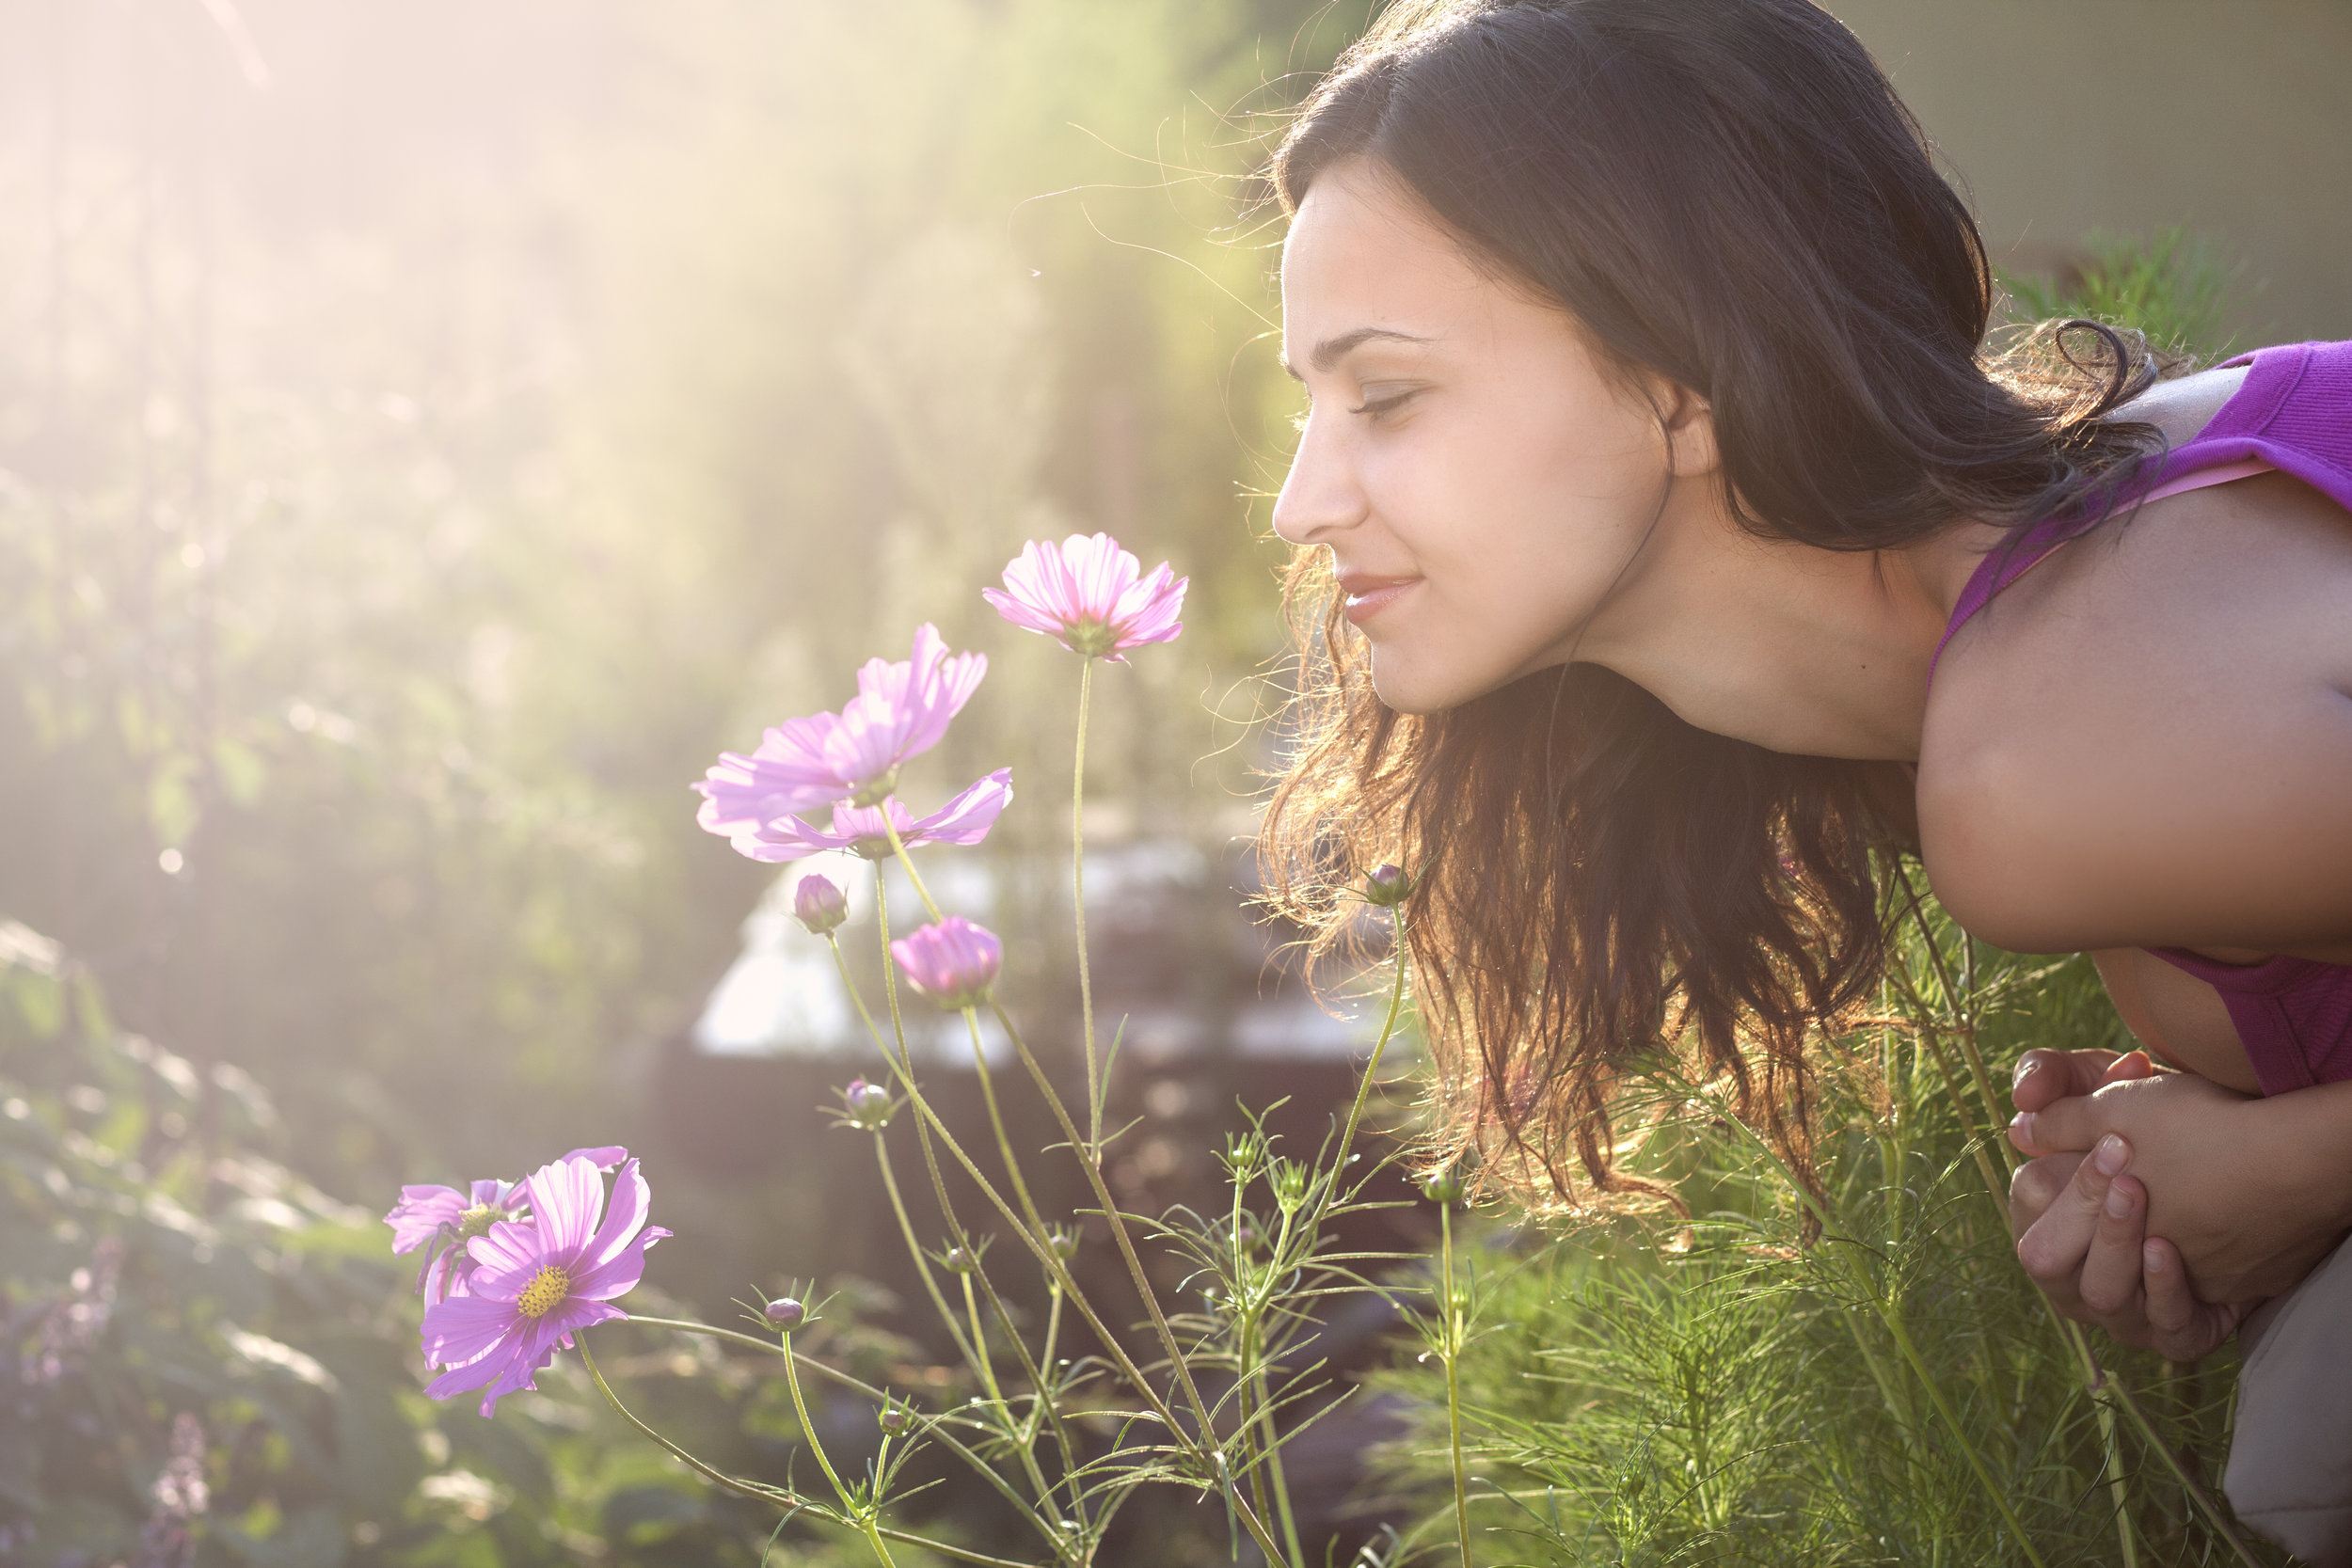 woman-smelling-flower.jpeg